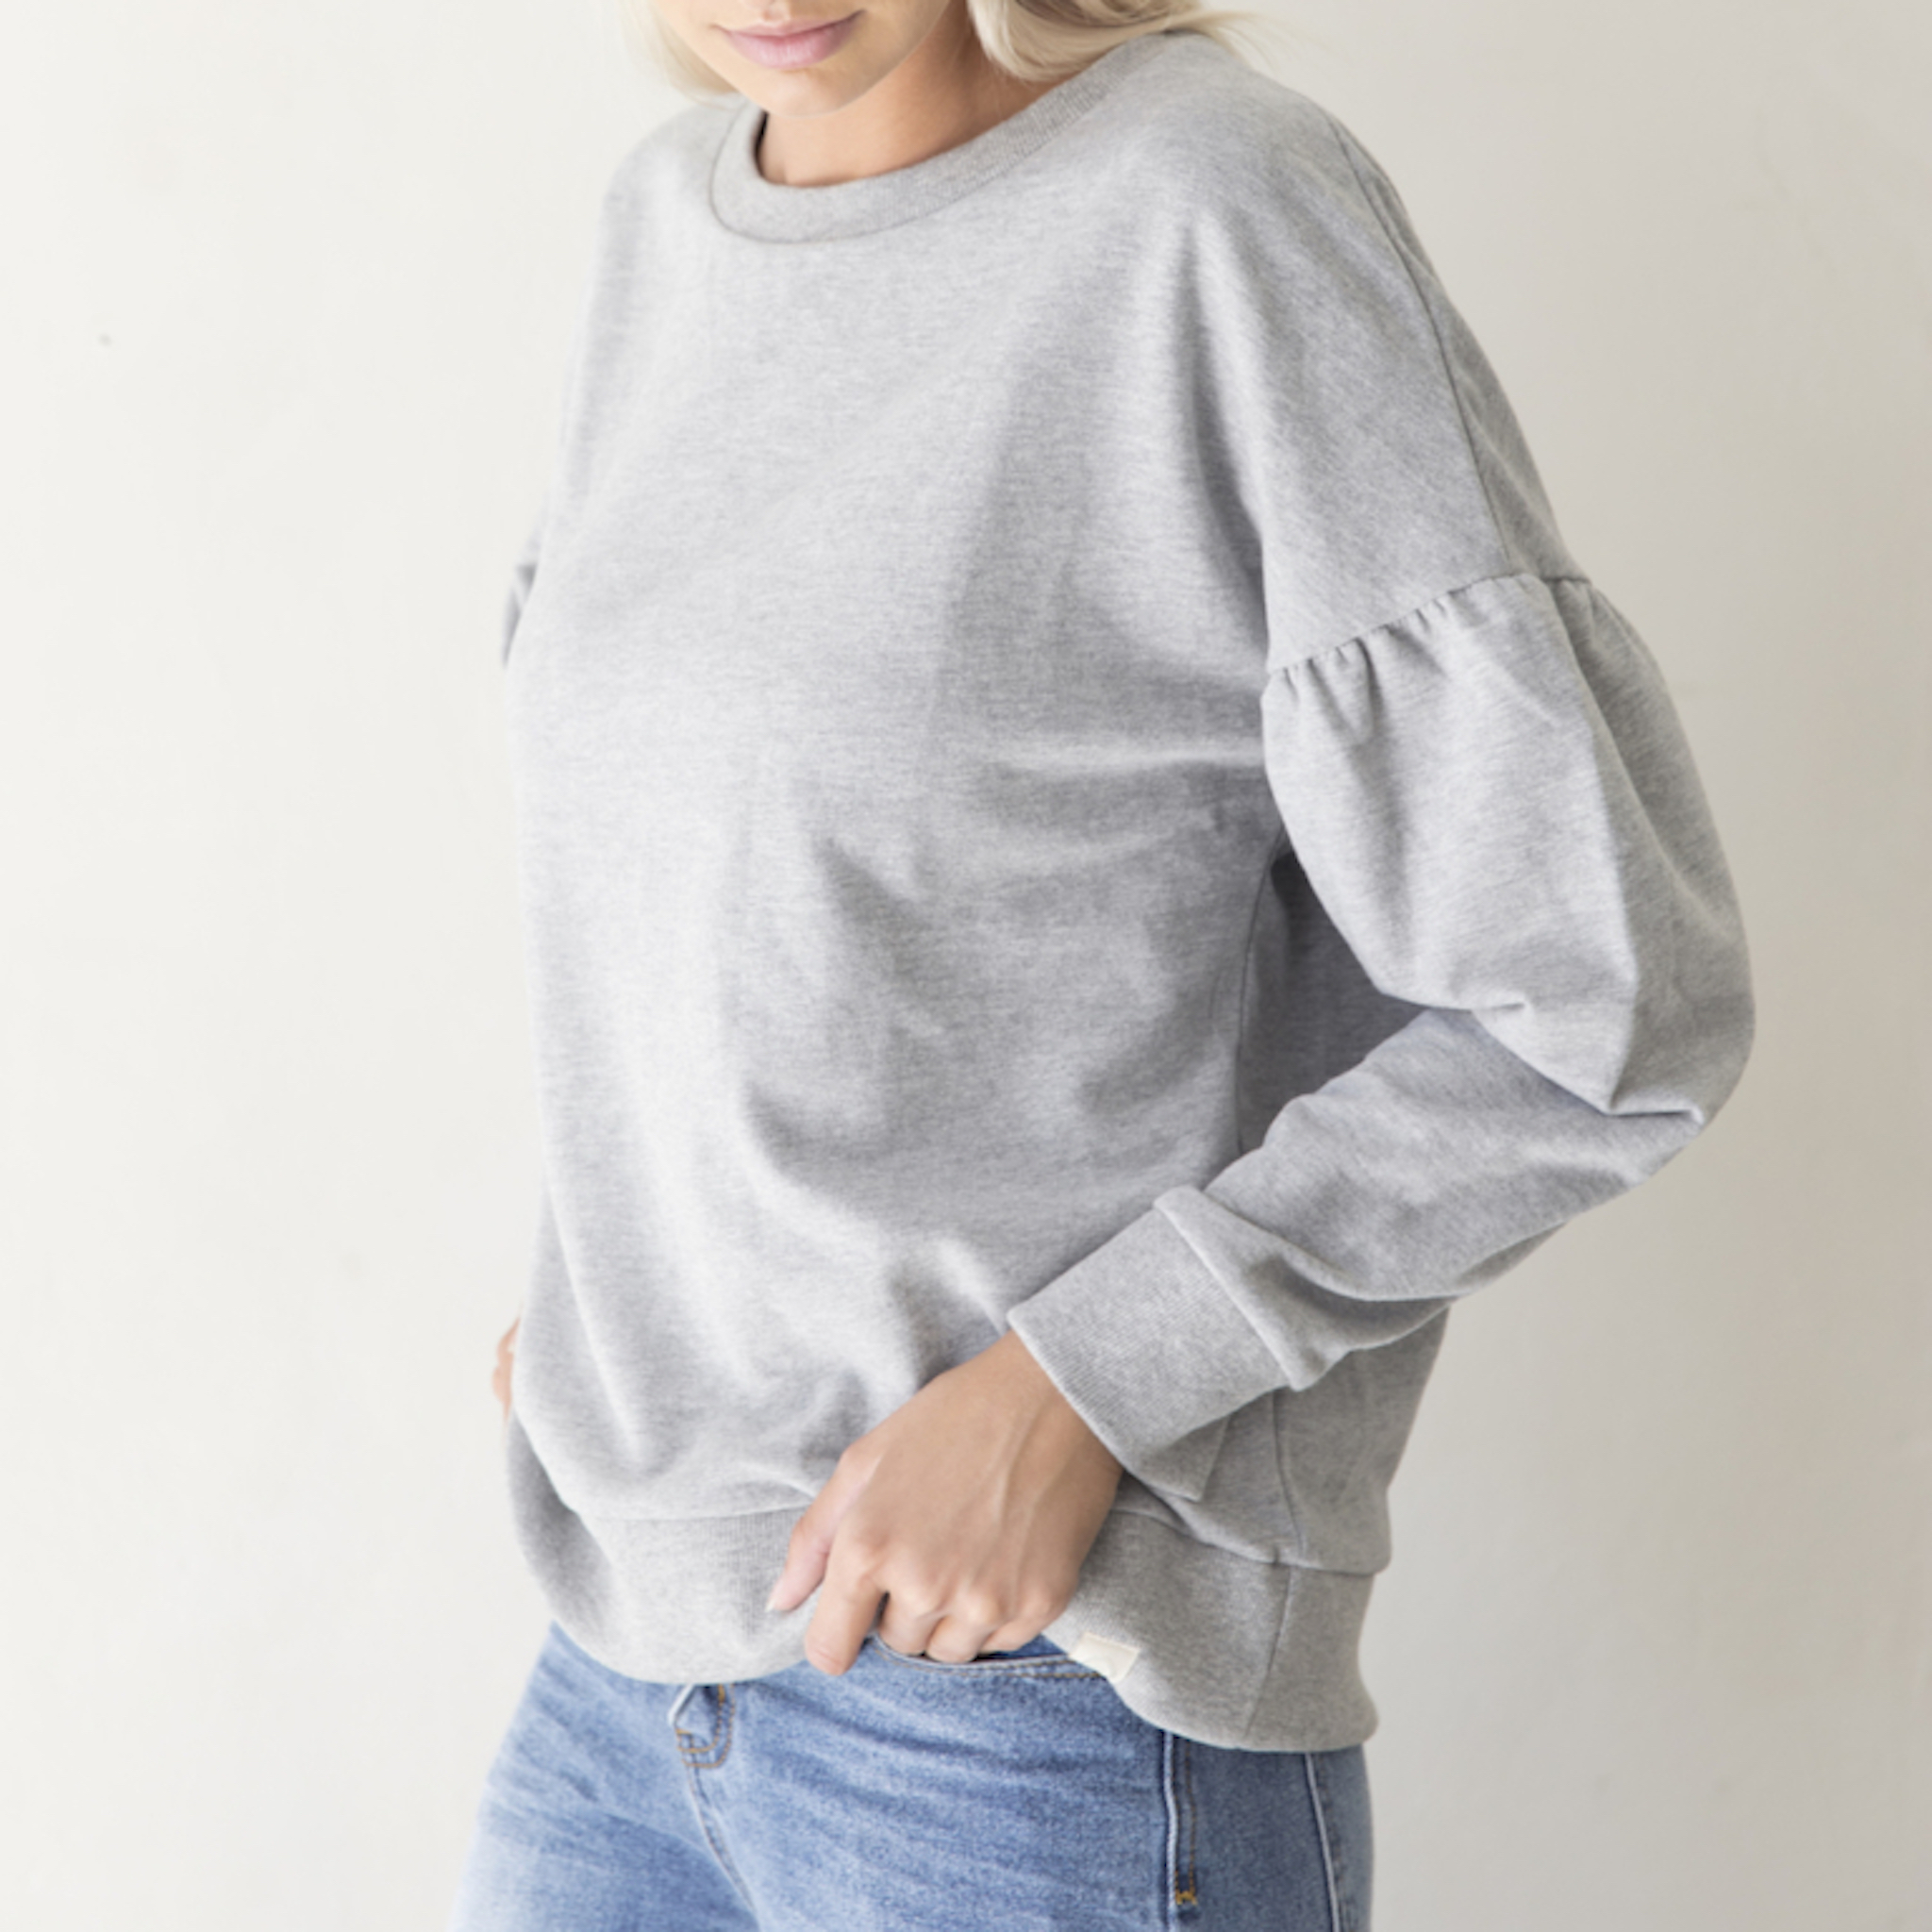 I dig denim - Wilder Sweater Organic - grey melange